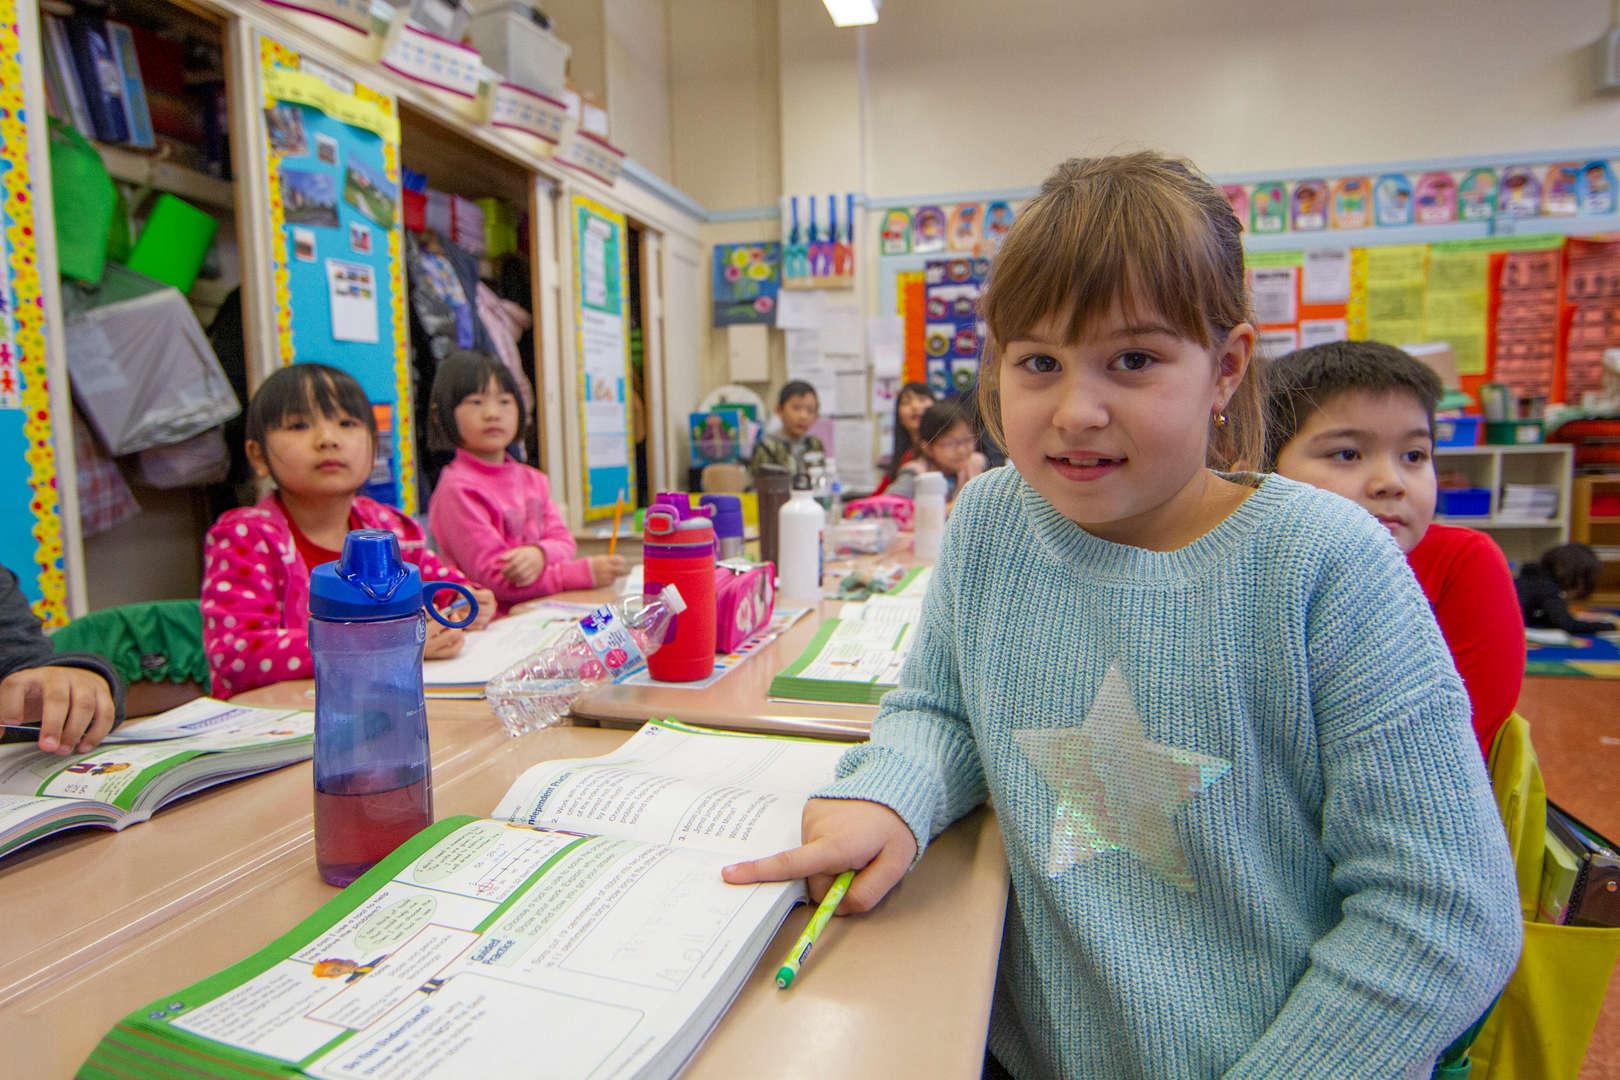 Girl pointing to worksheet on her desk